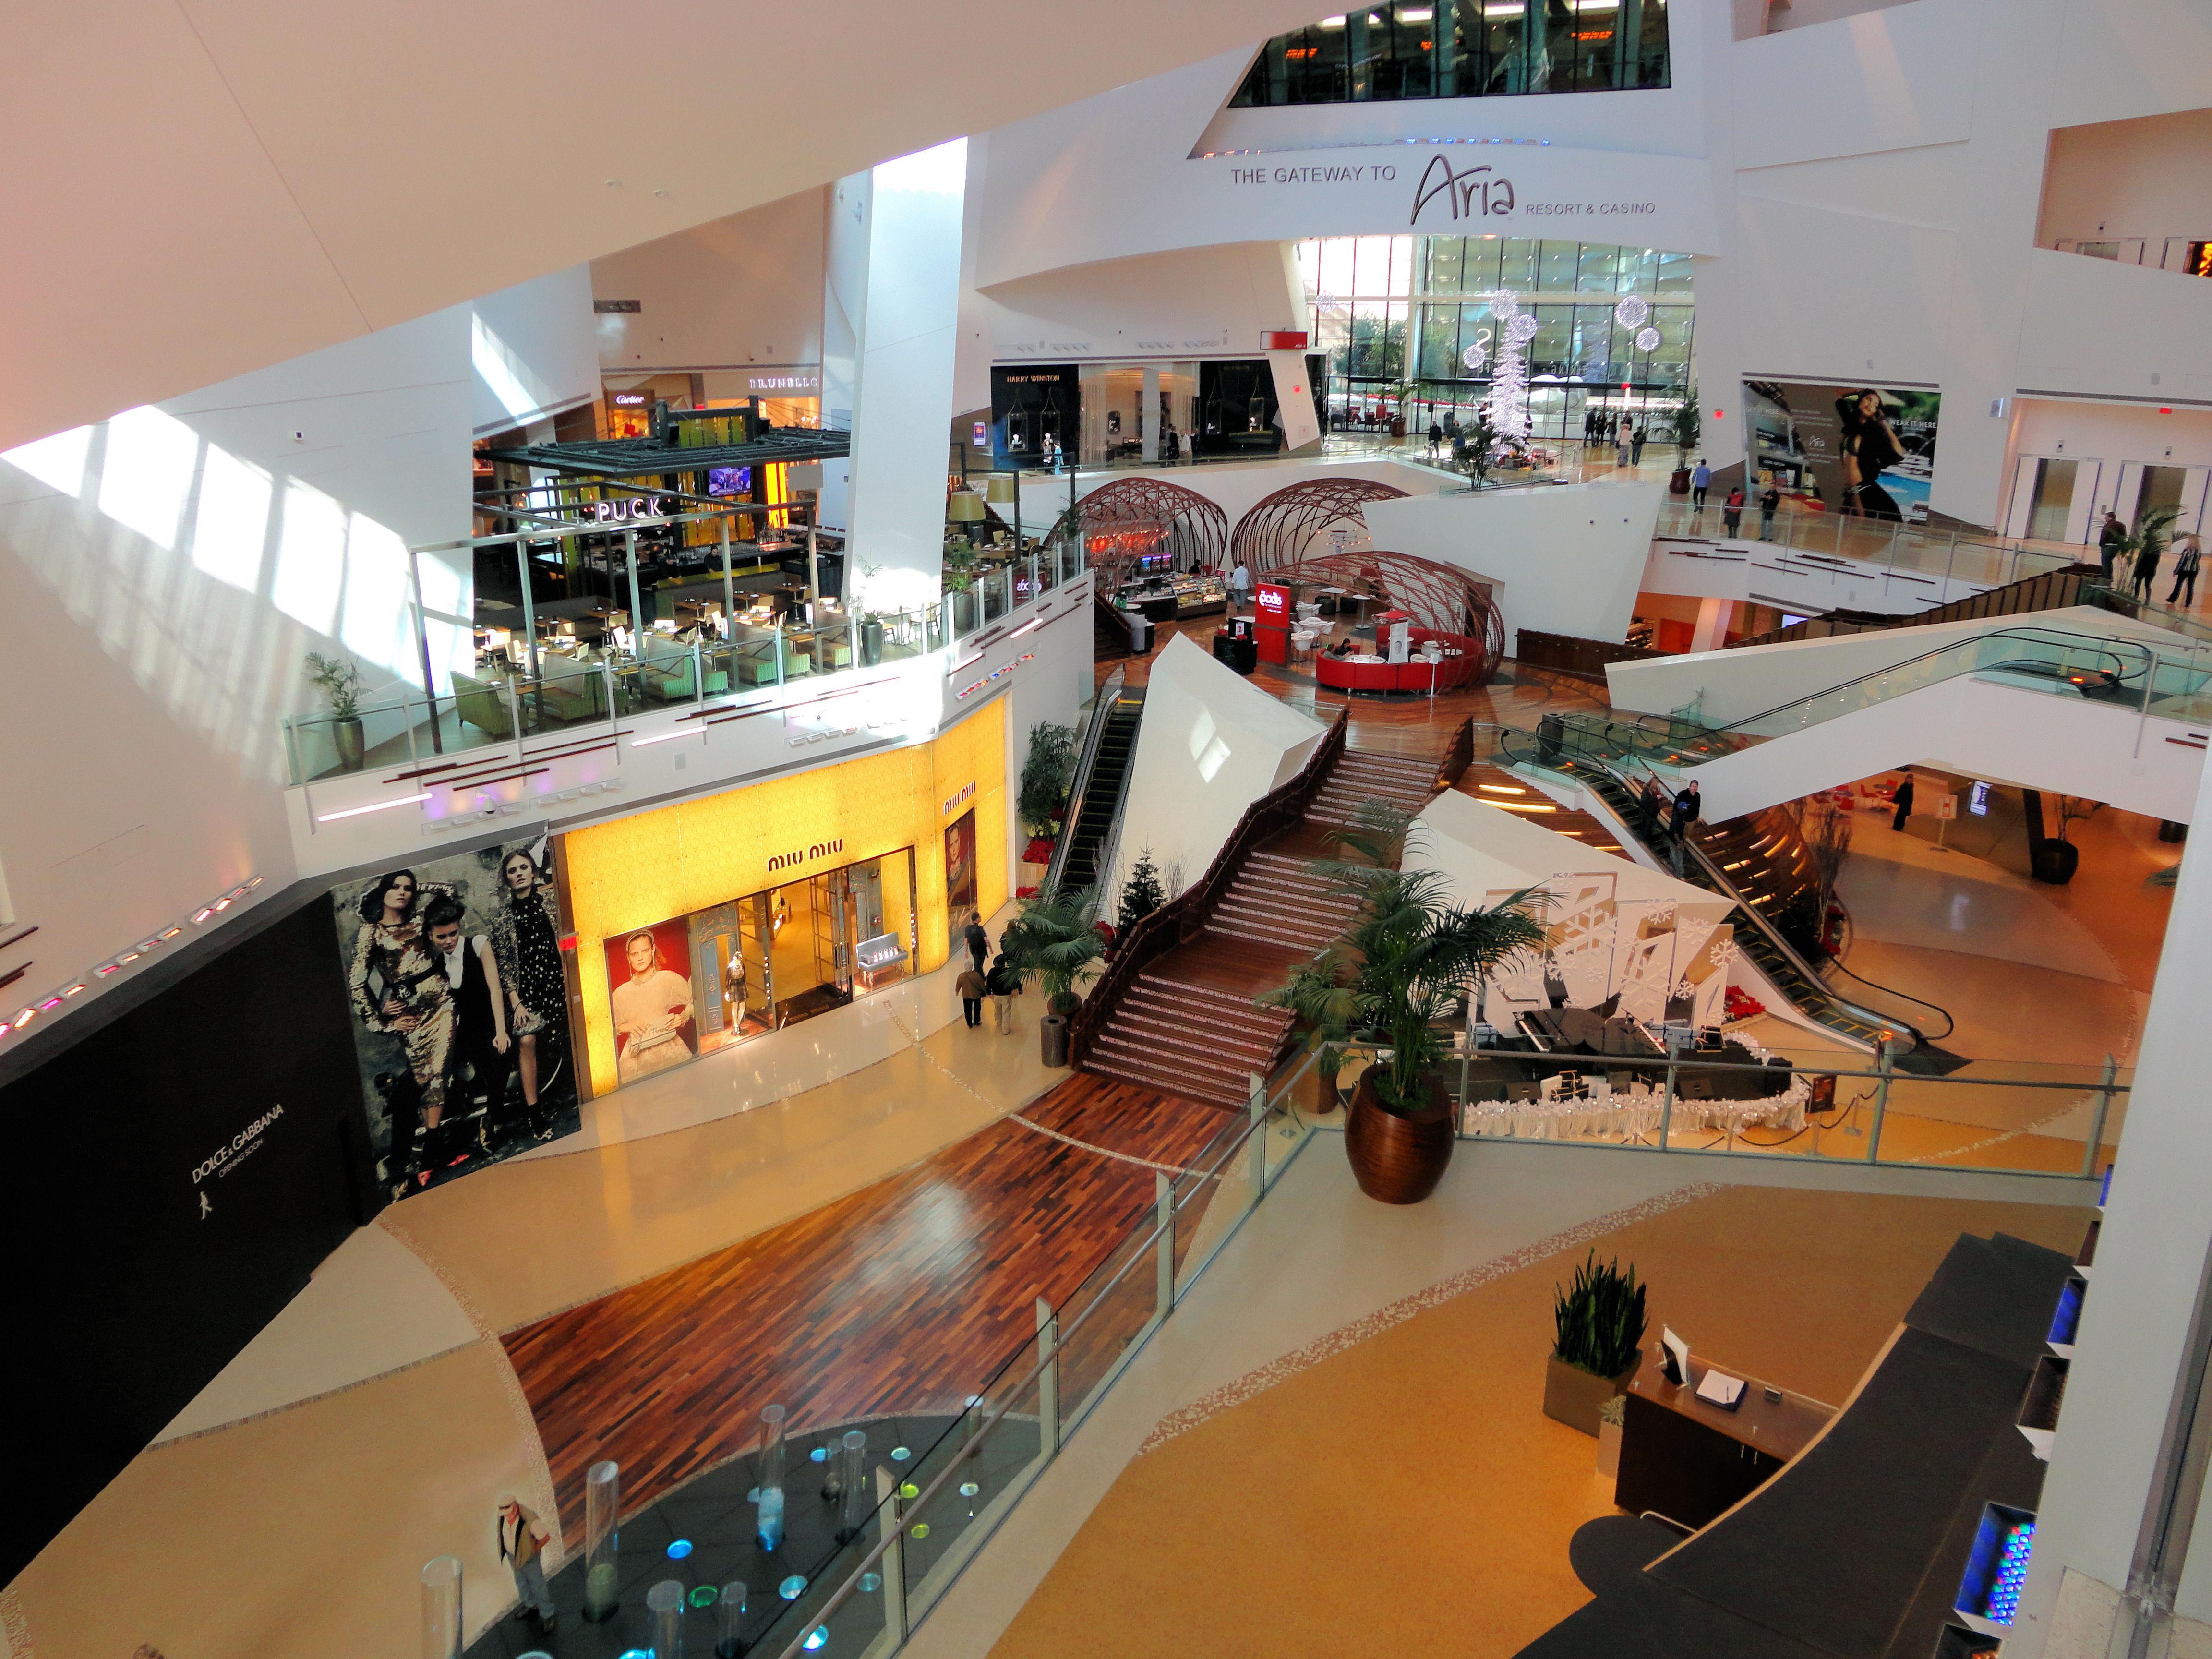 File Crystals Retail And Entertainment City Center Las Vegas Nevada Usa